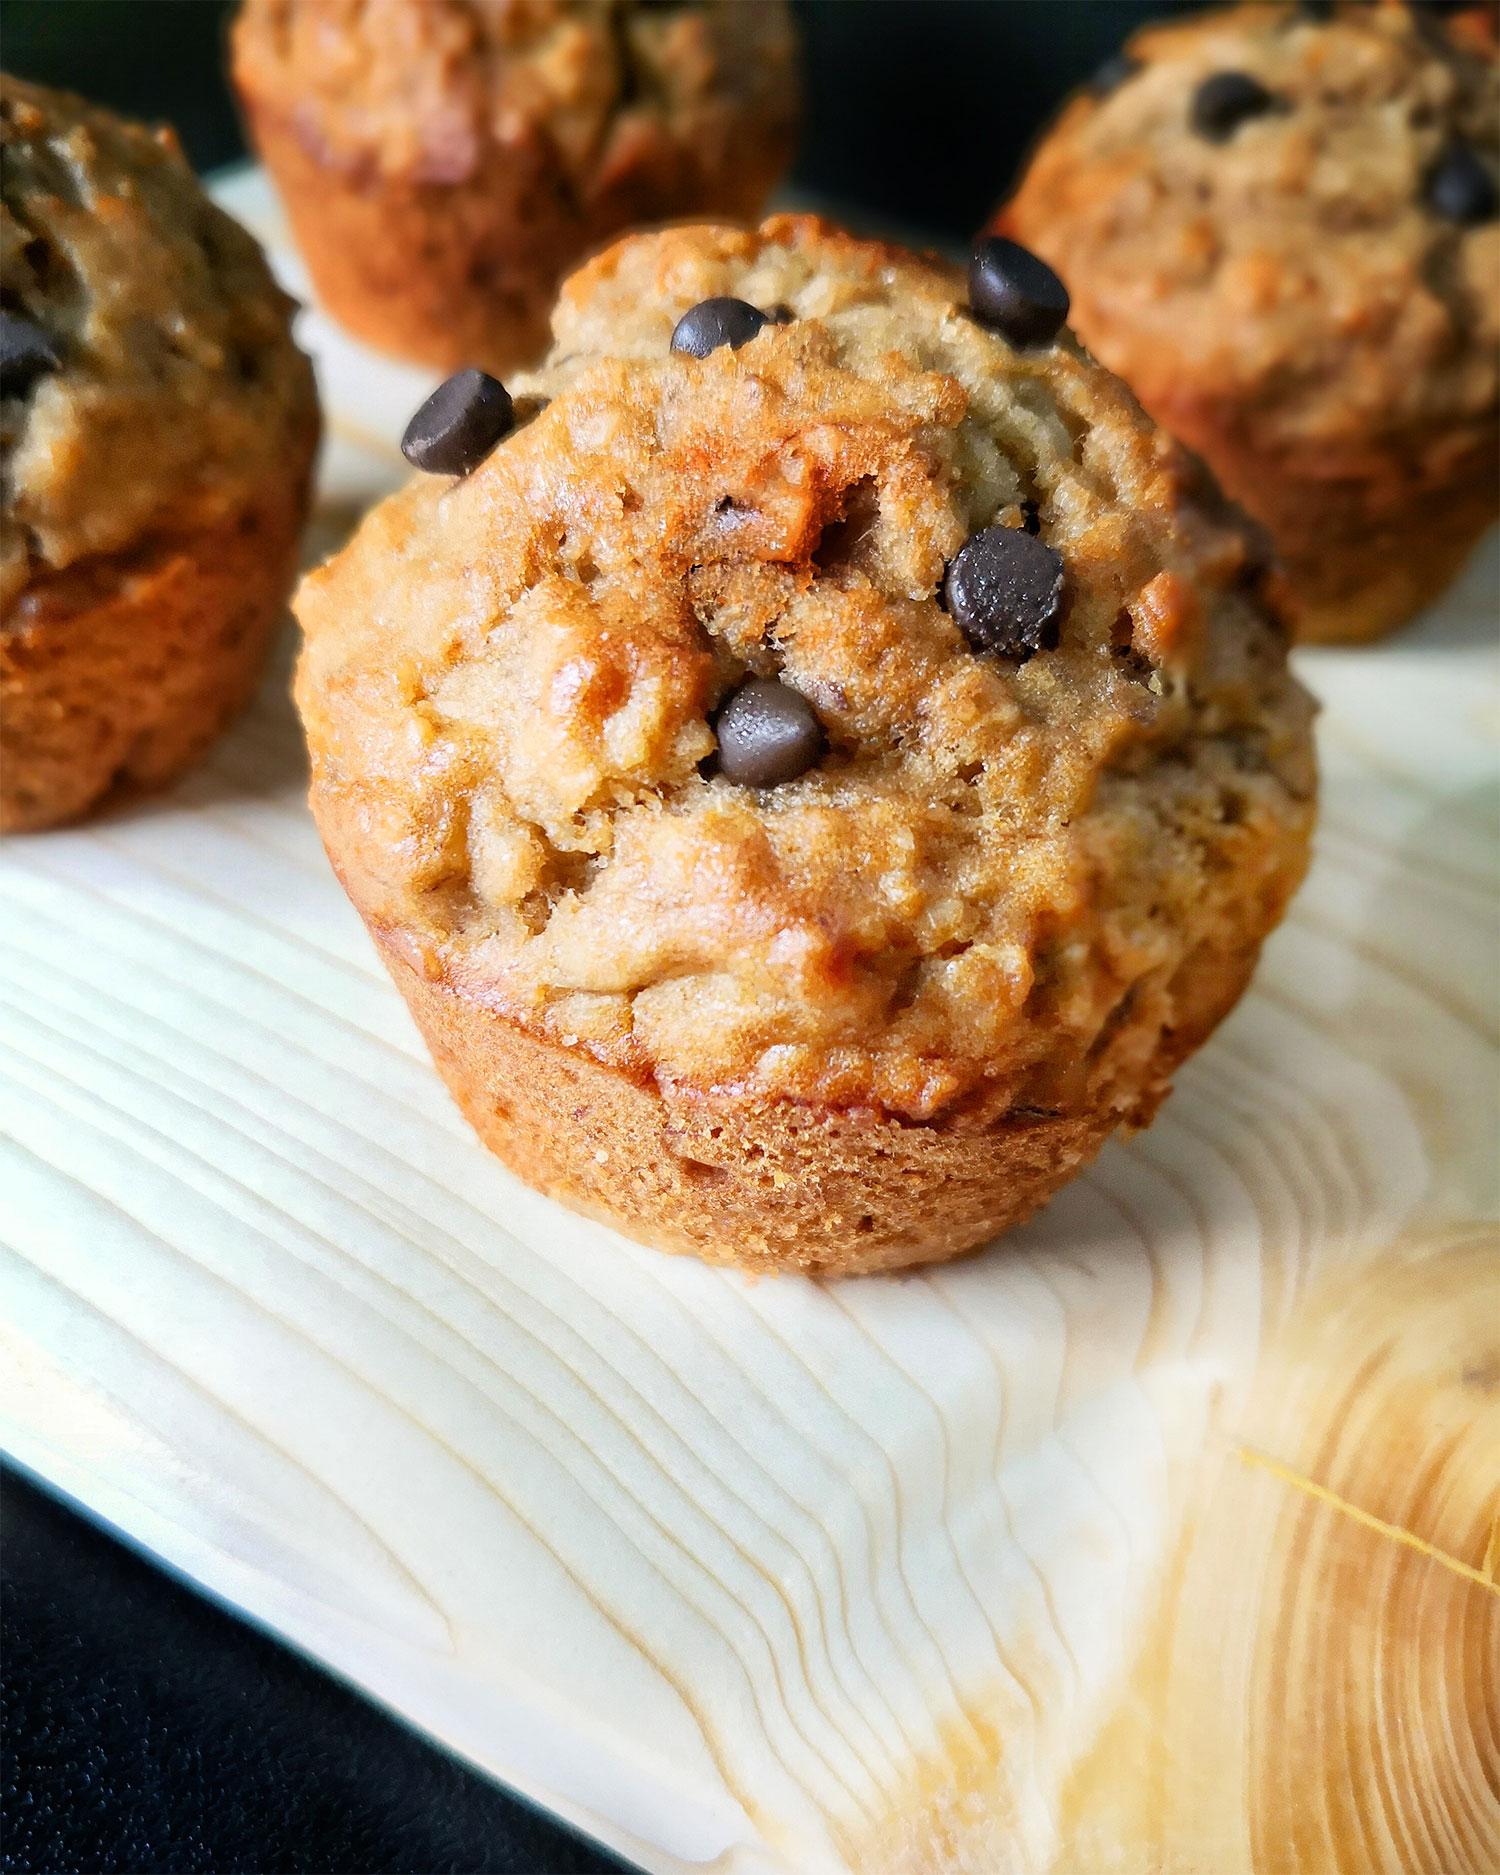 Chocolate Chip Banana Oatmeal Muffins Recipe